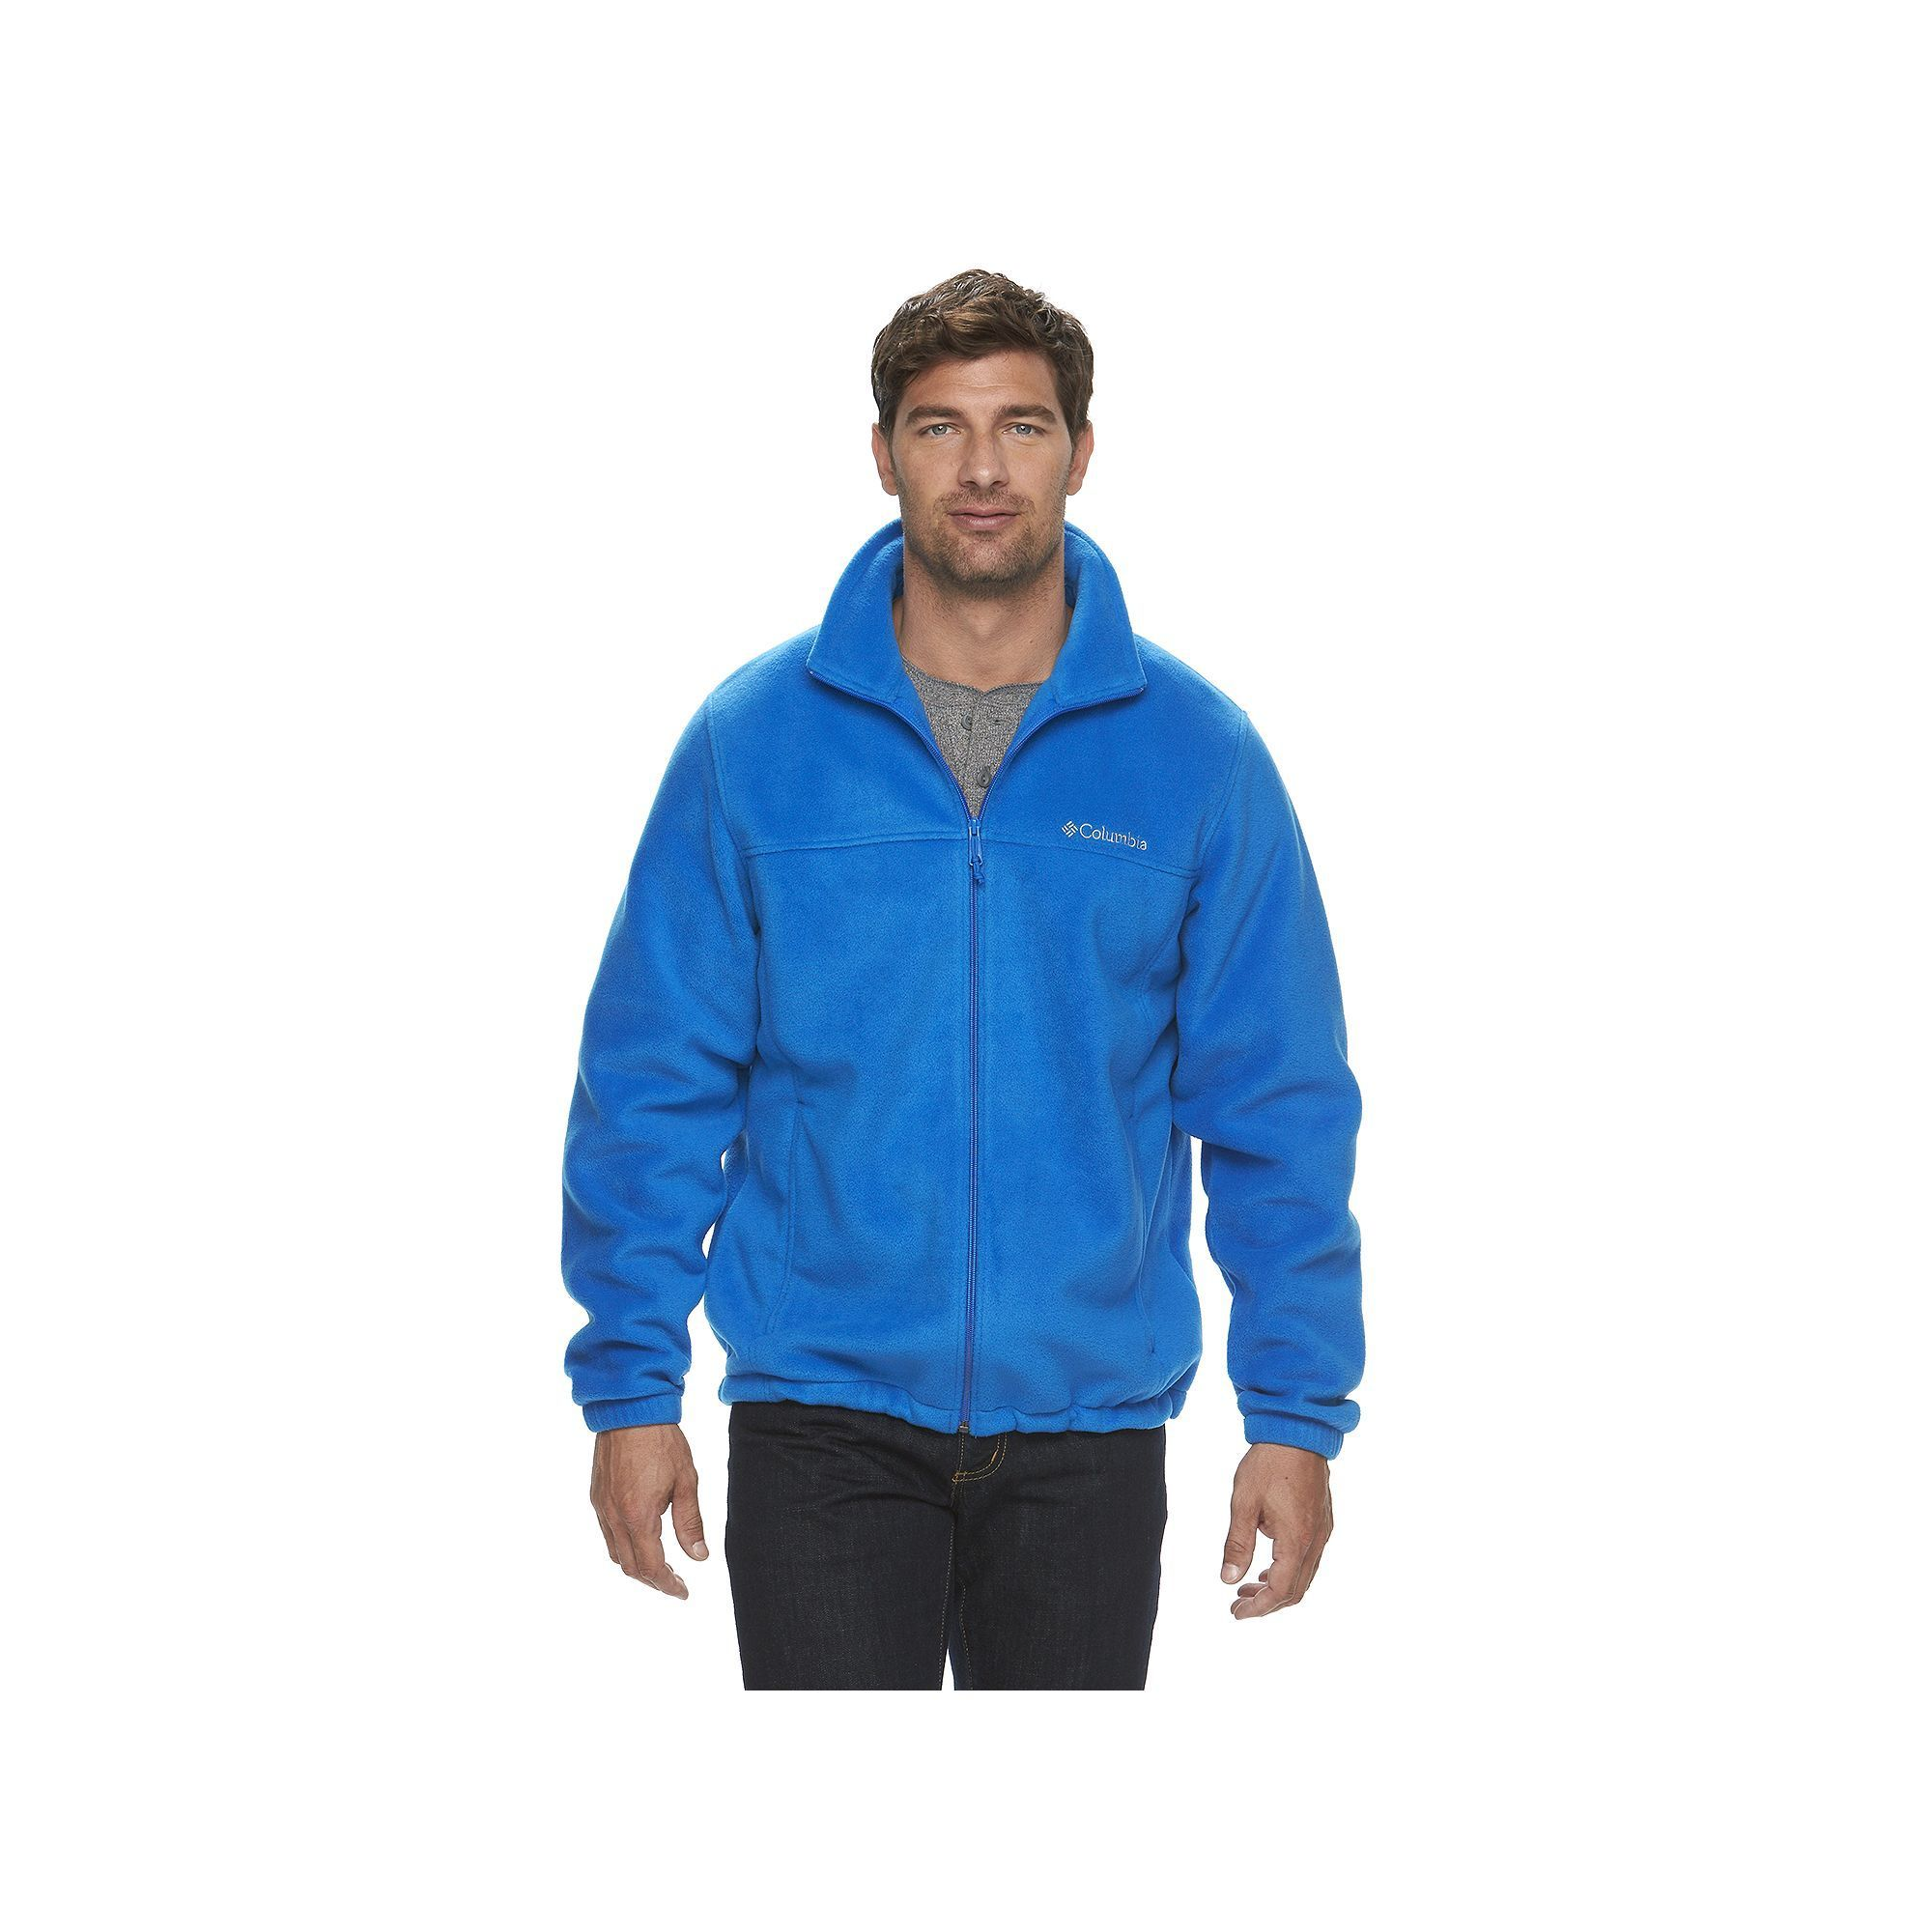 248b665cb29 Men's Columbia Flattop Ridge Fleece Jacket, Size: Small, Brt Blue, Durable